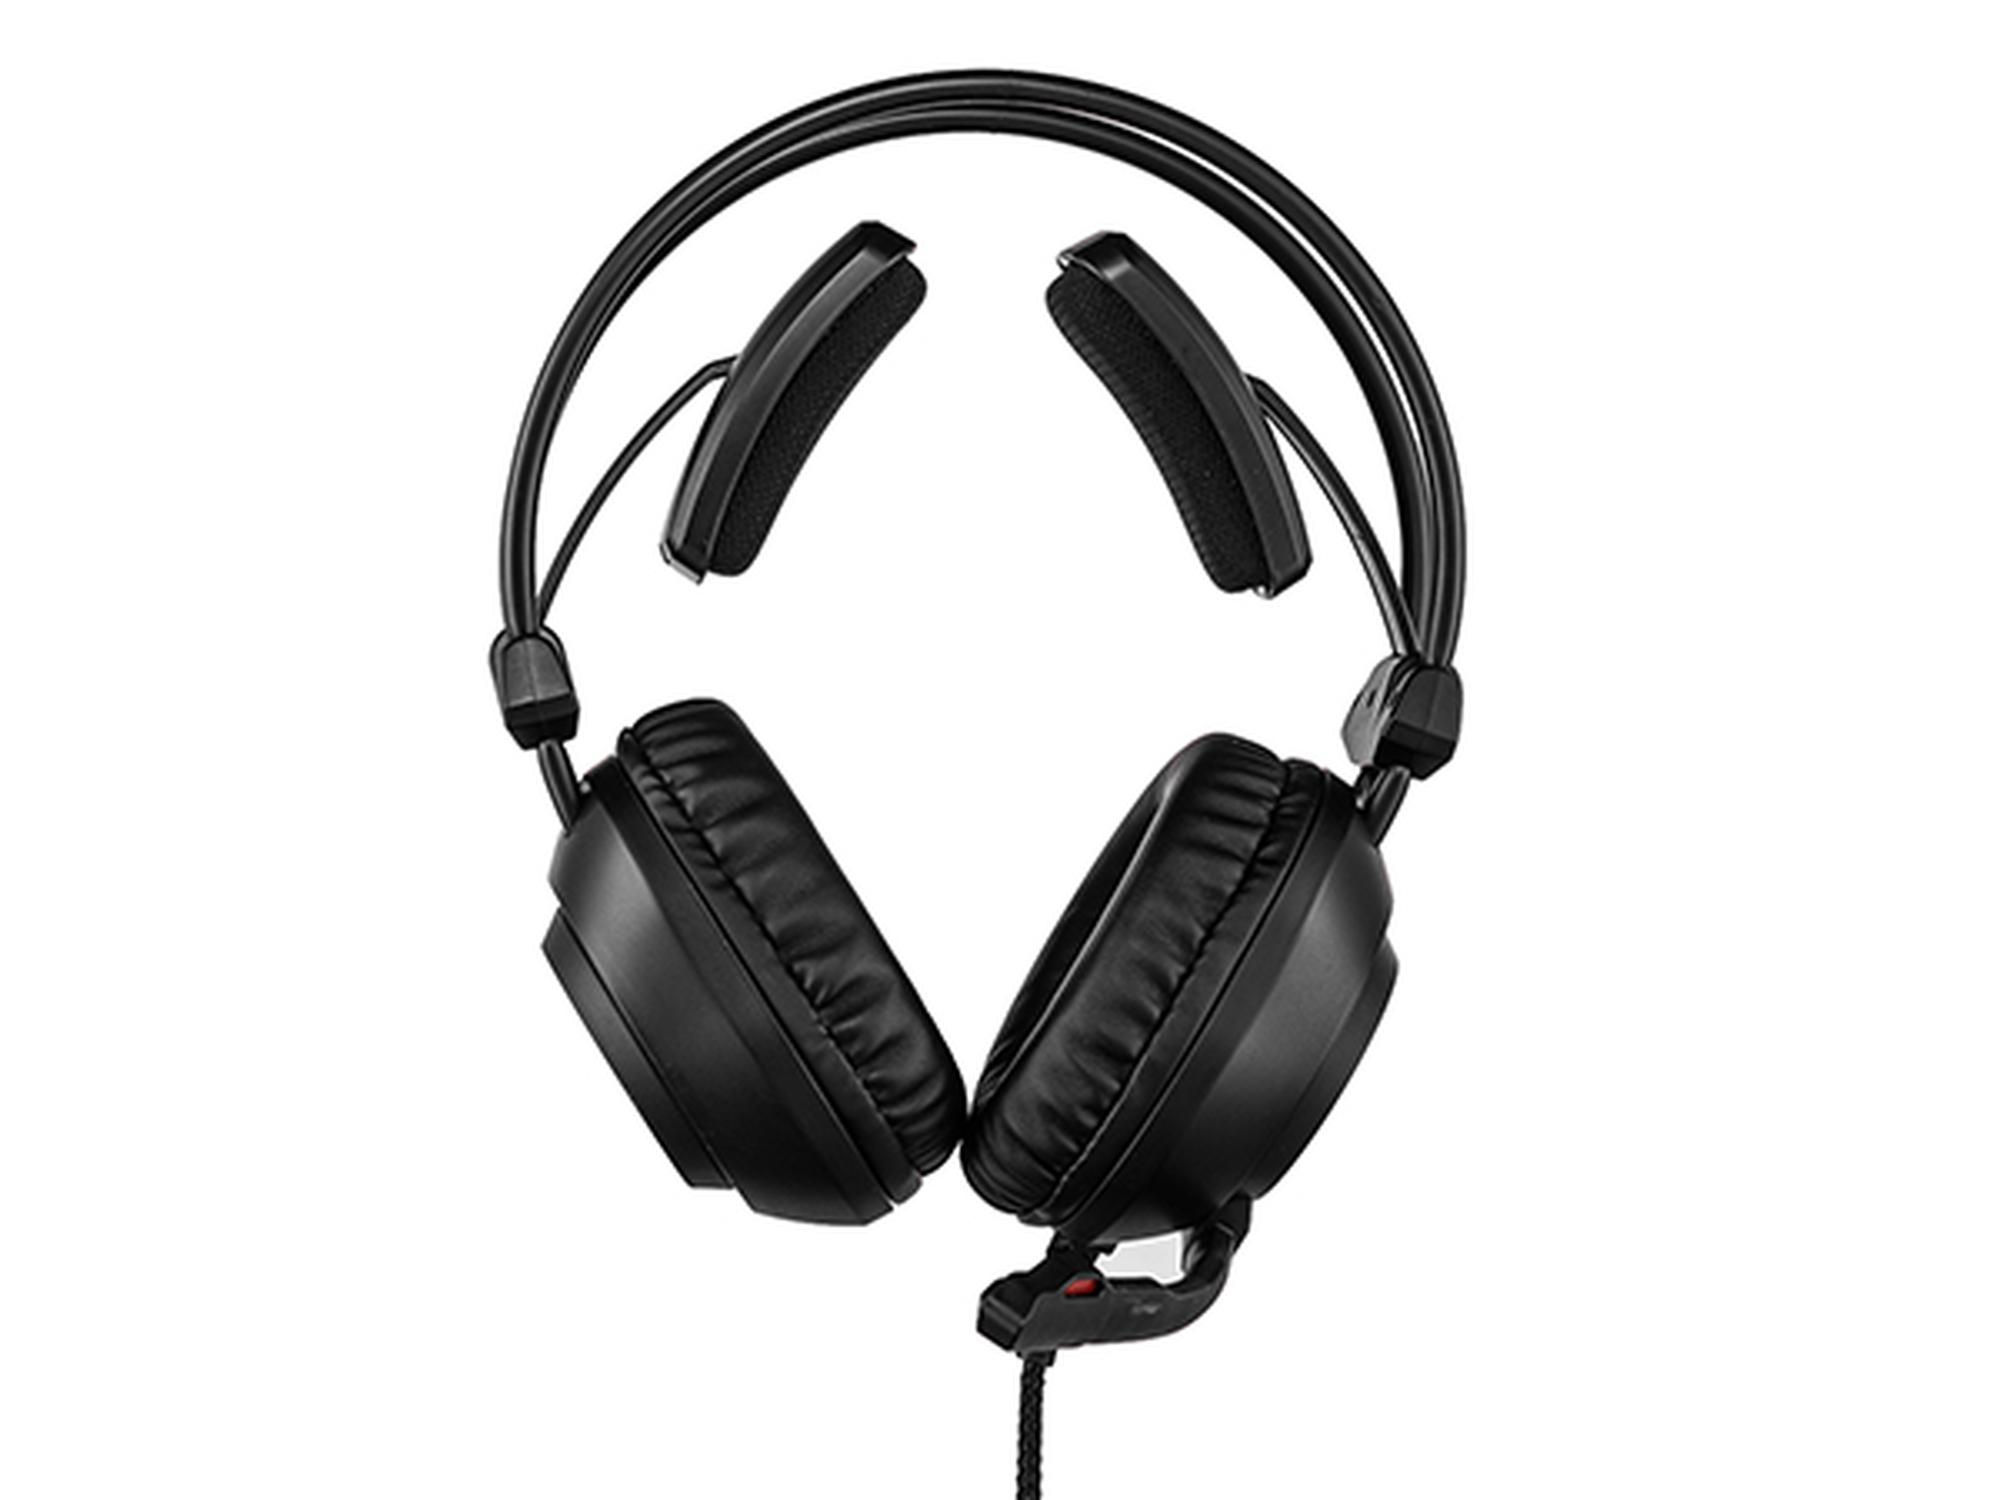 Sandberg 126-08 Headsets